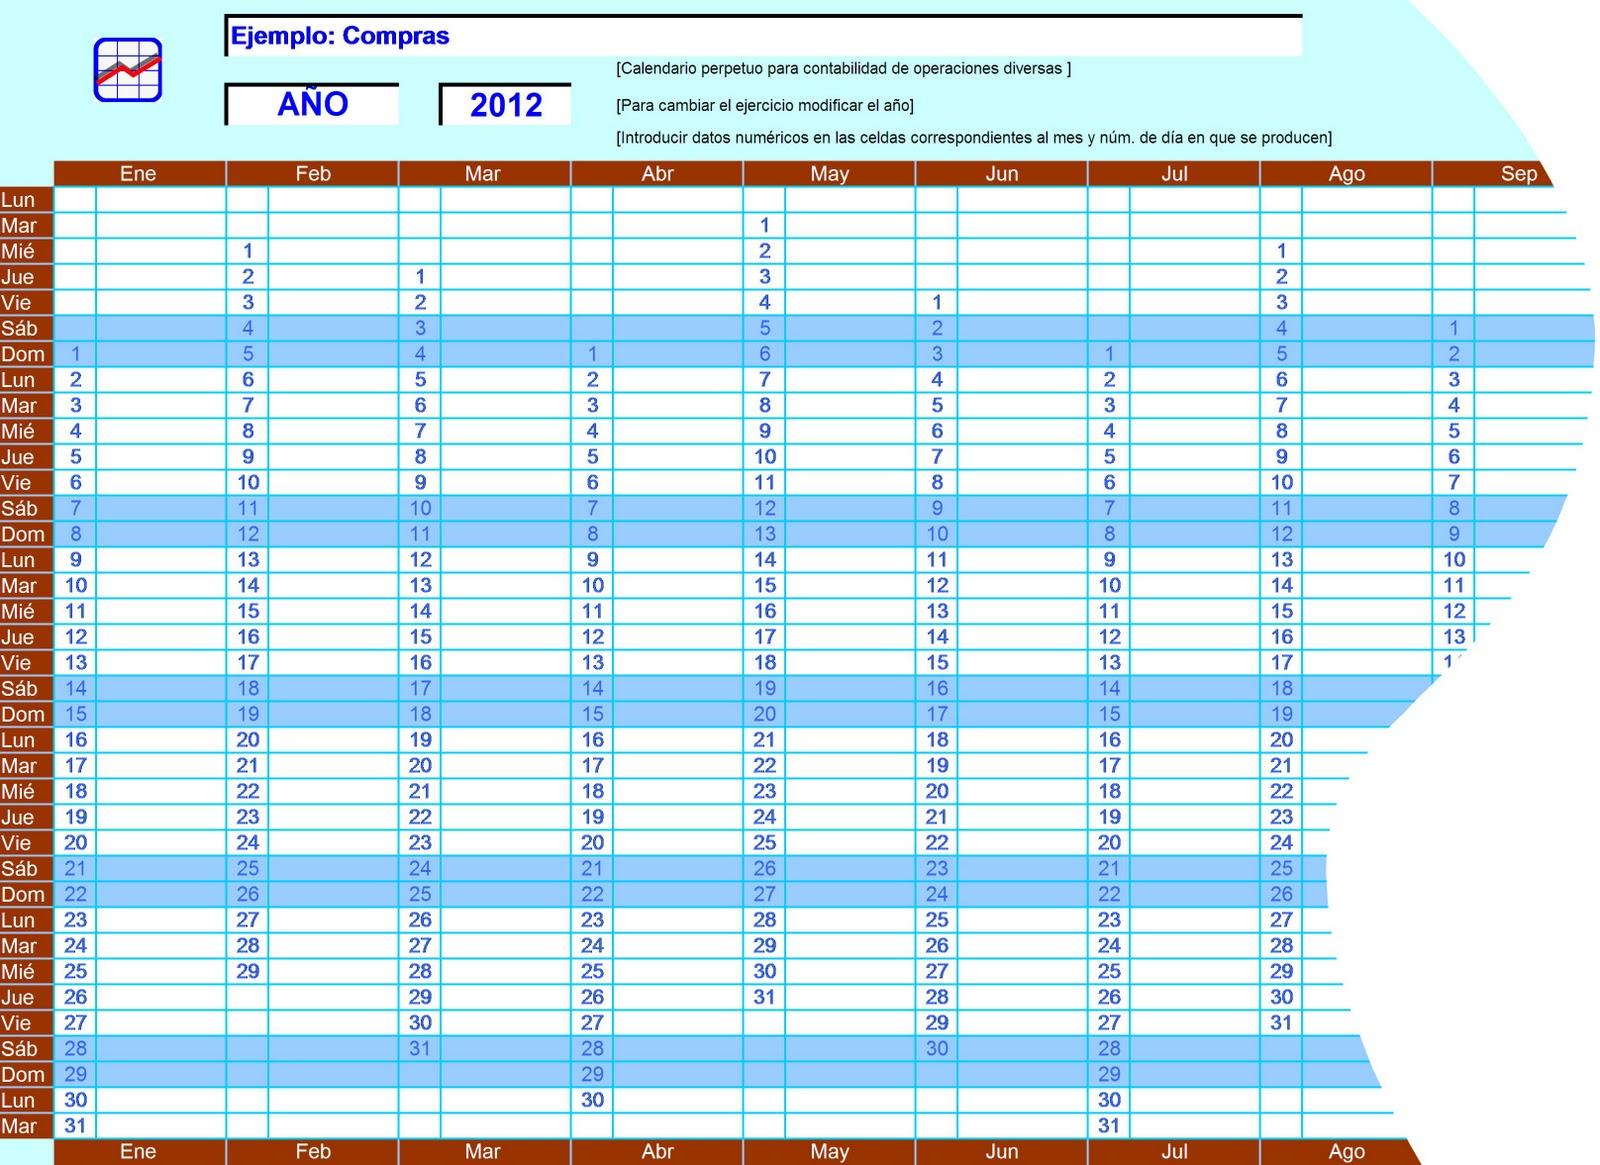 Calendario 2018 Xls - takvim kalender HD